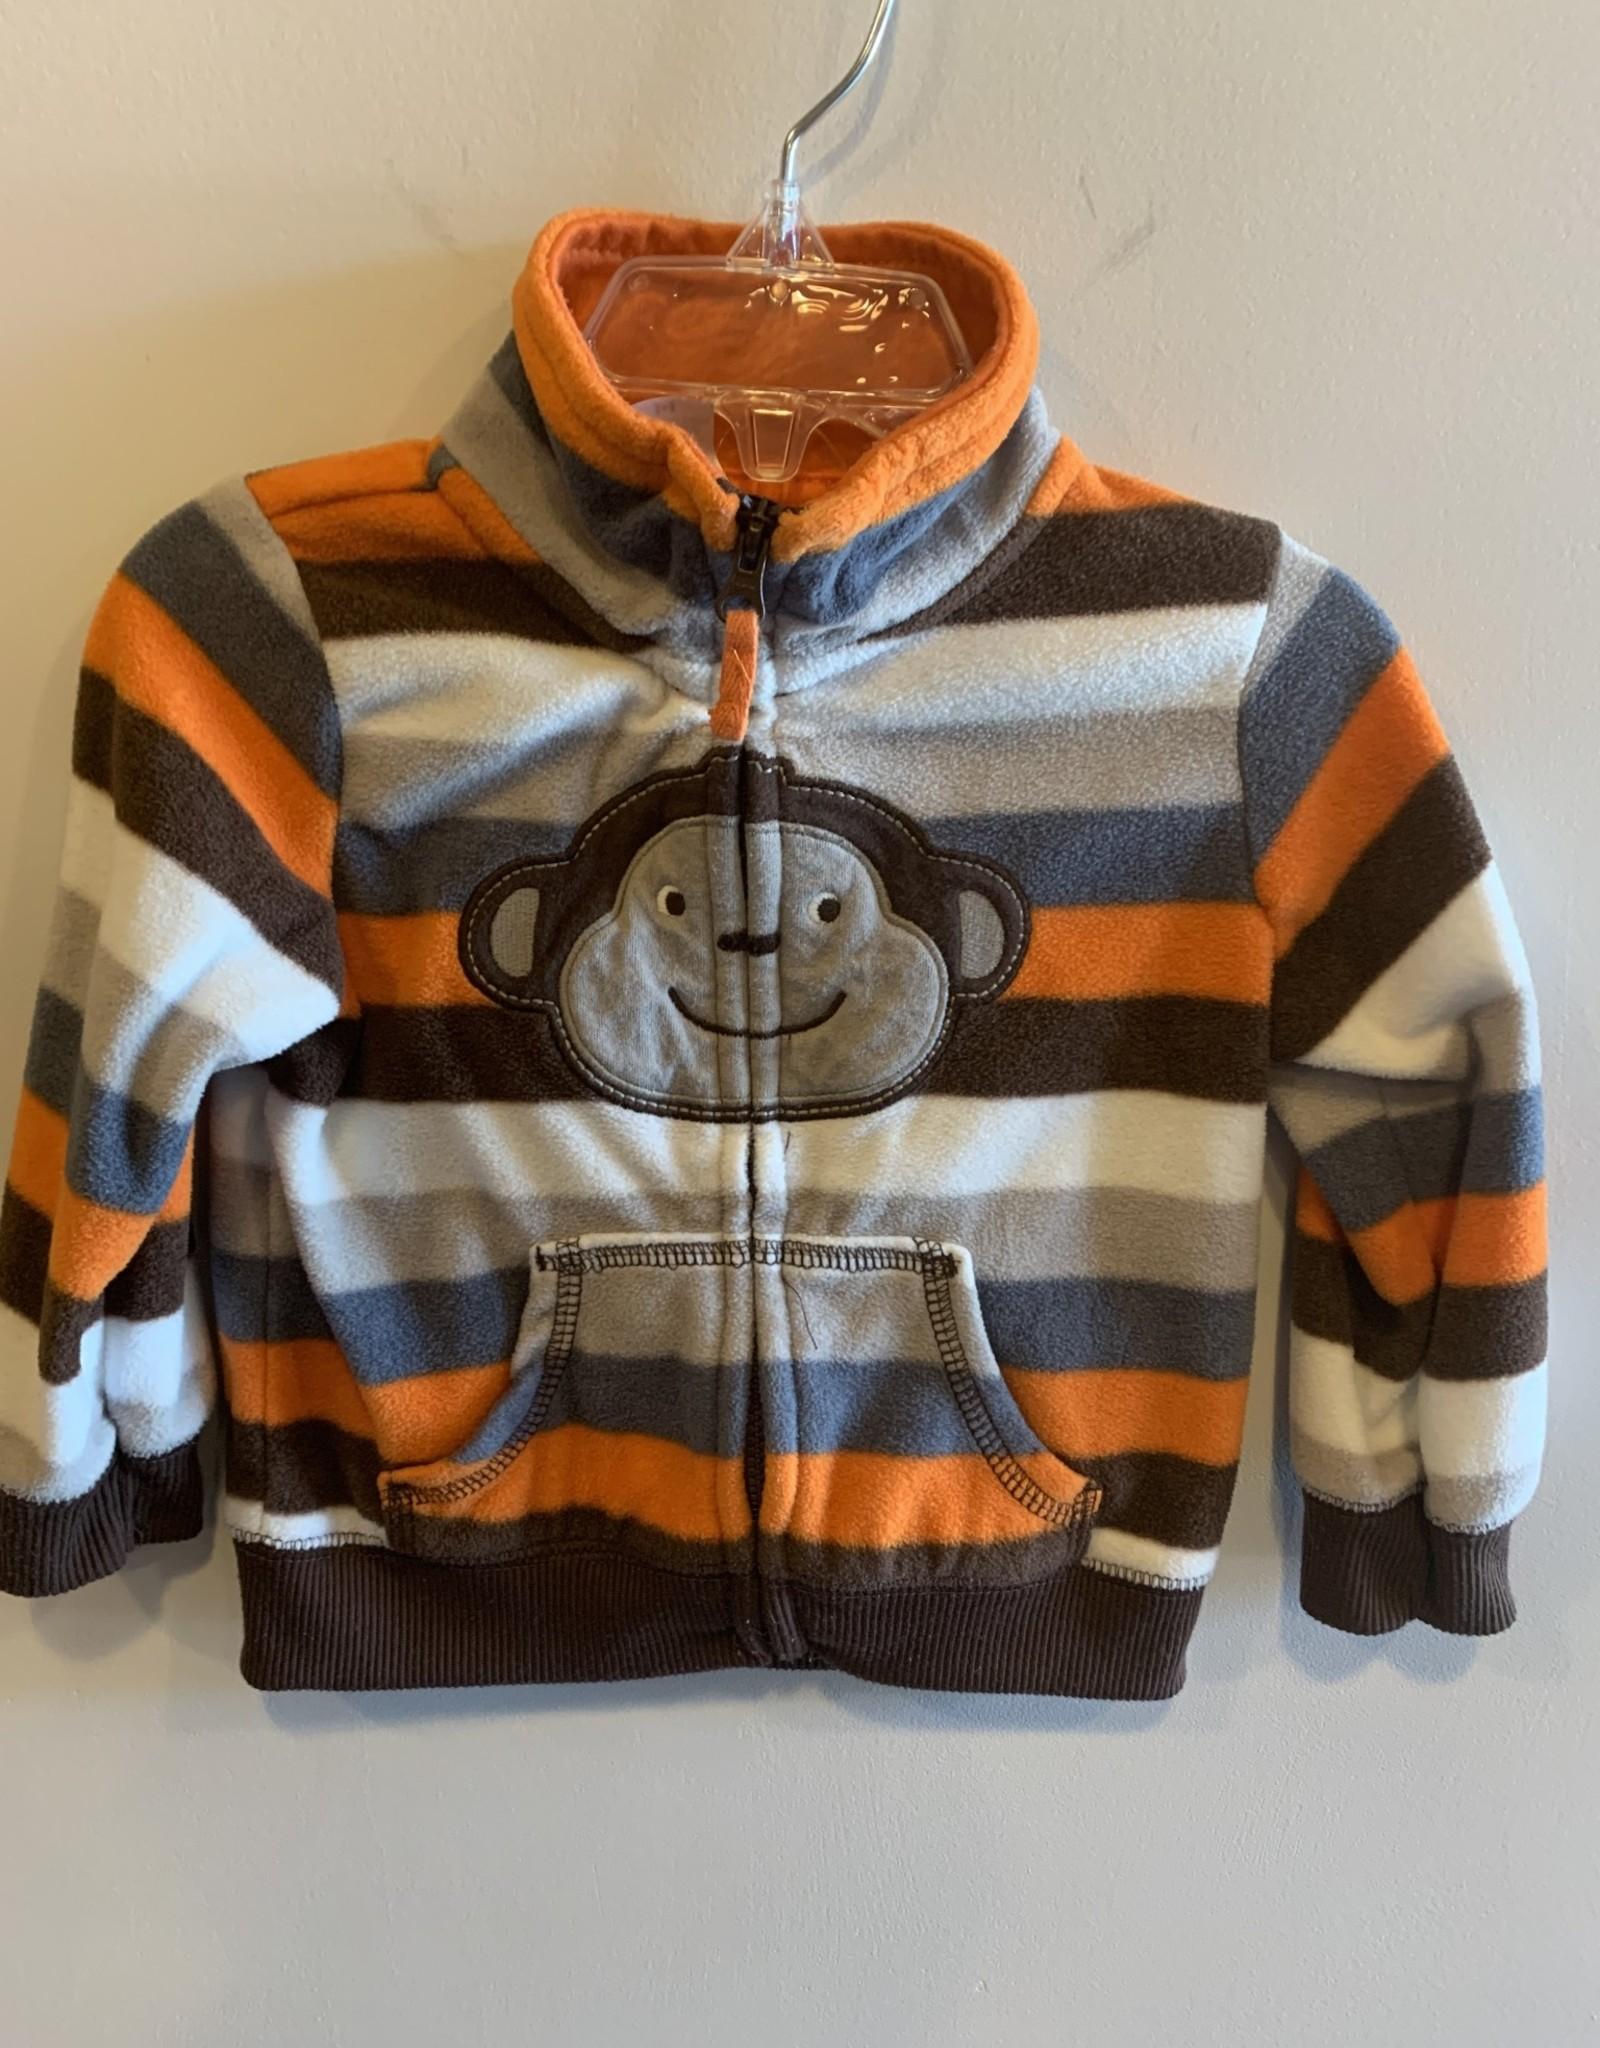 Carter's Boys/9-12/Carters/Sweater